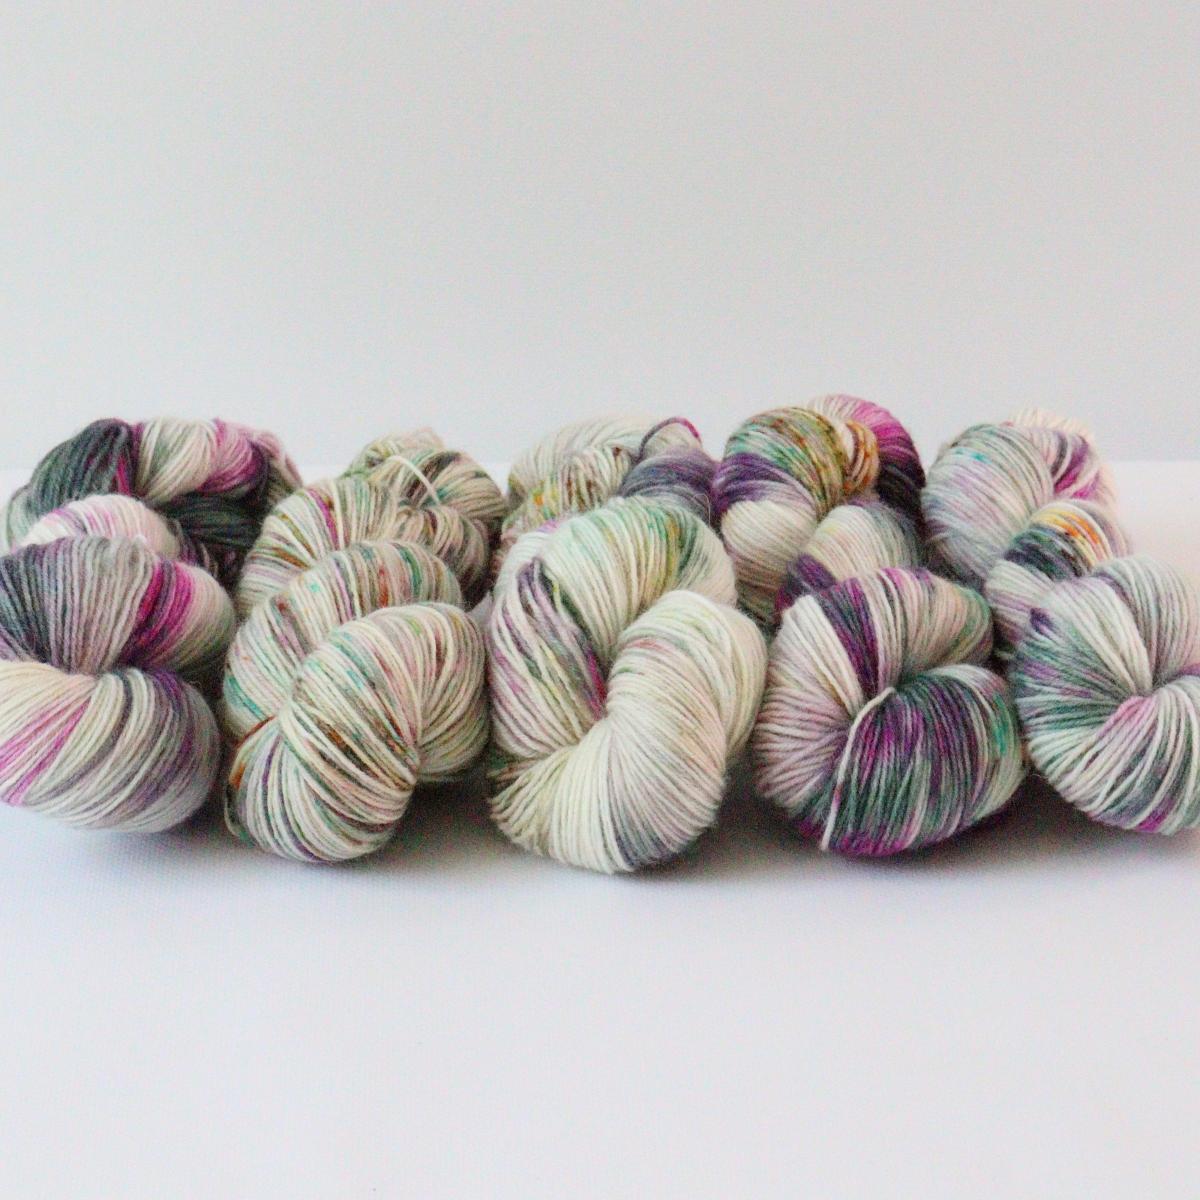 woodico.pro hand dyed yarn 079 1 1200x1200 - Hand dyed yarn / 079